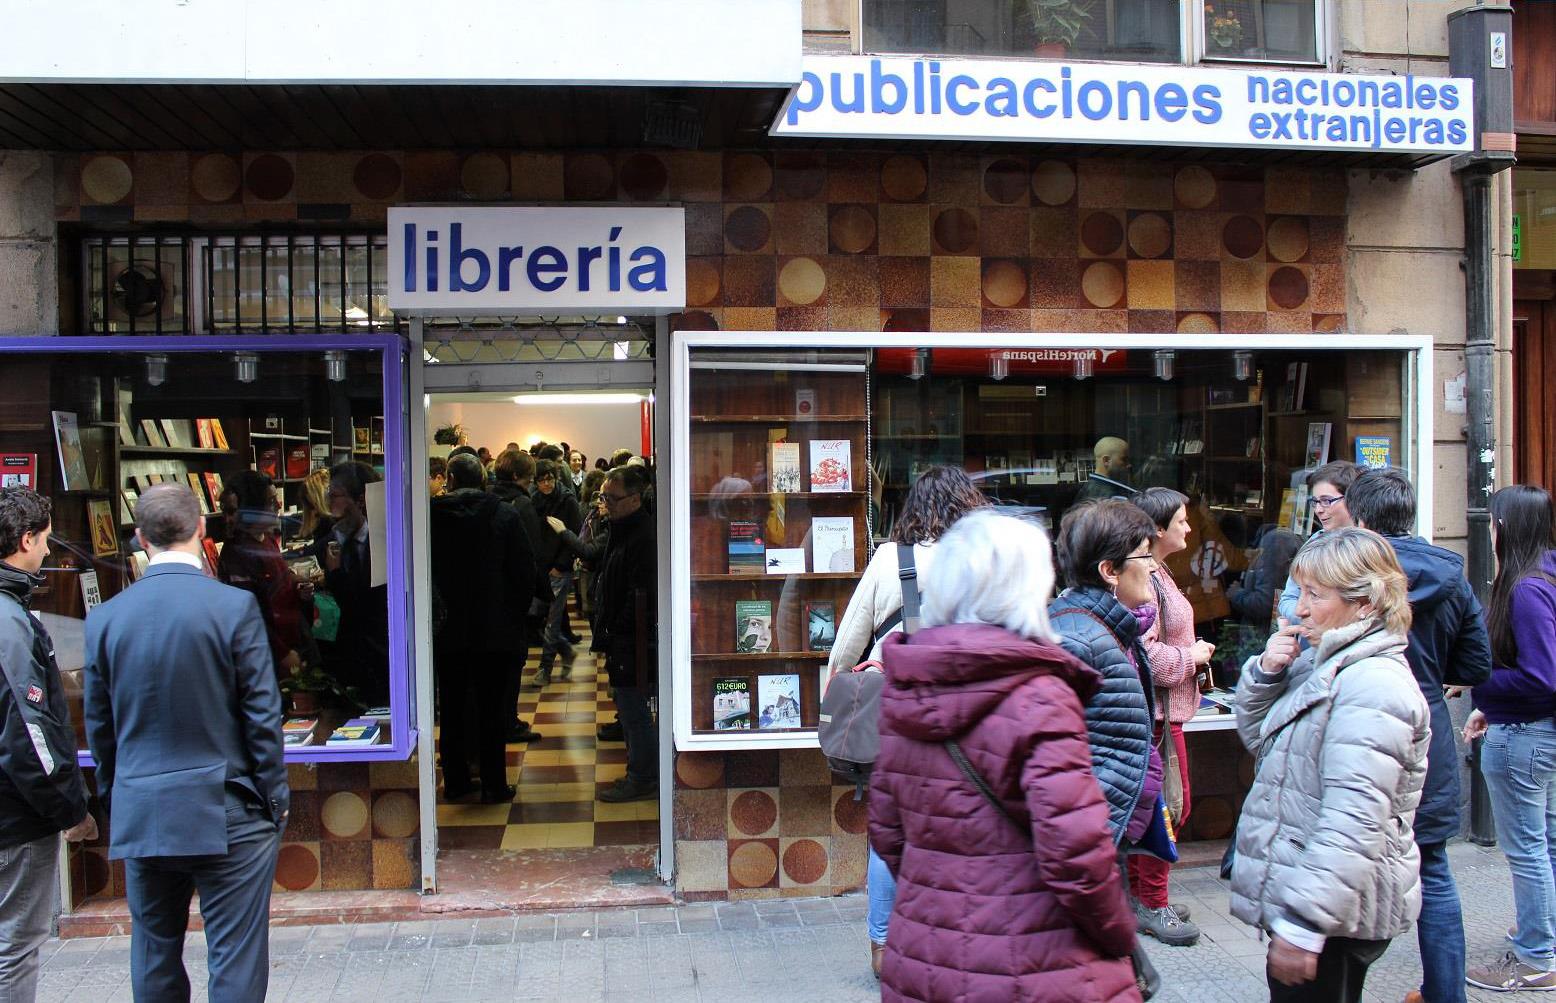 Libreria Louise Michel en Bilbao